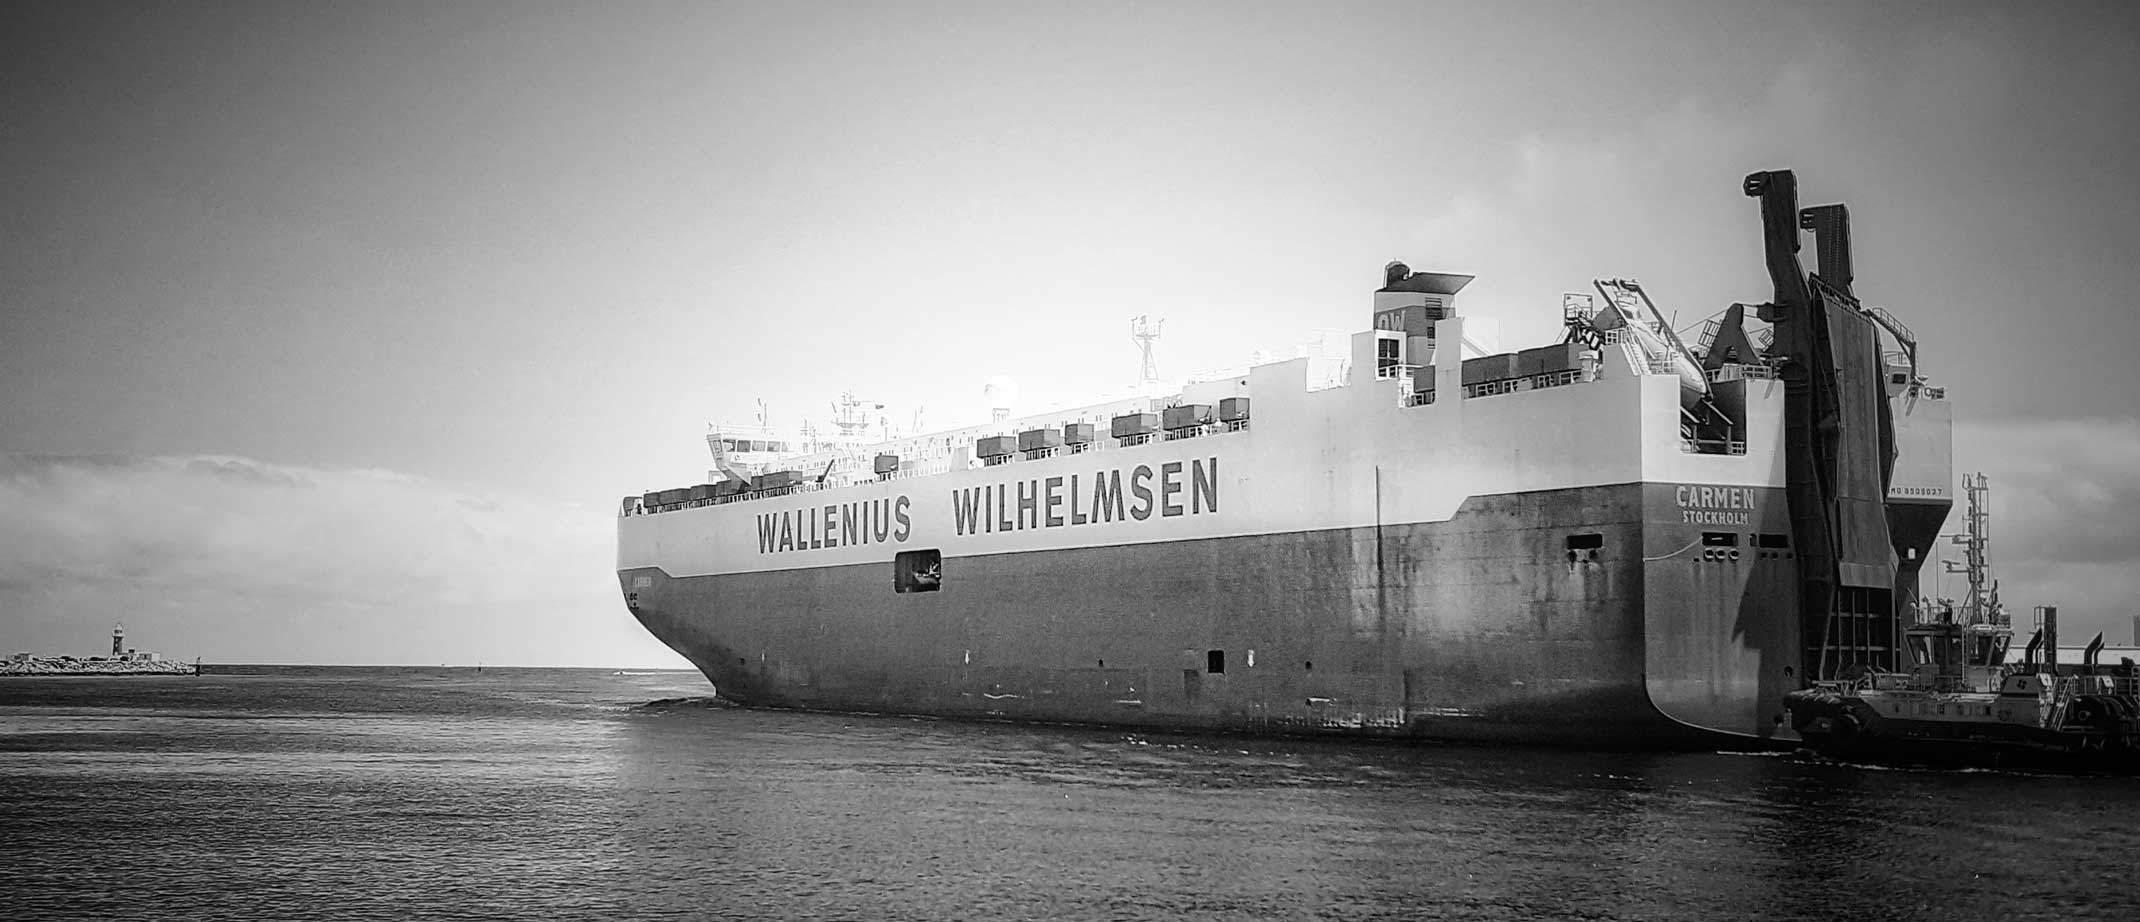 carmen-ship-sweden-fremantle-port-2